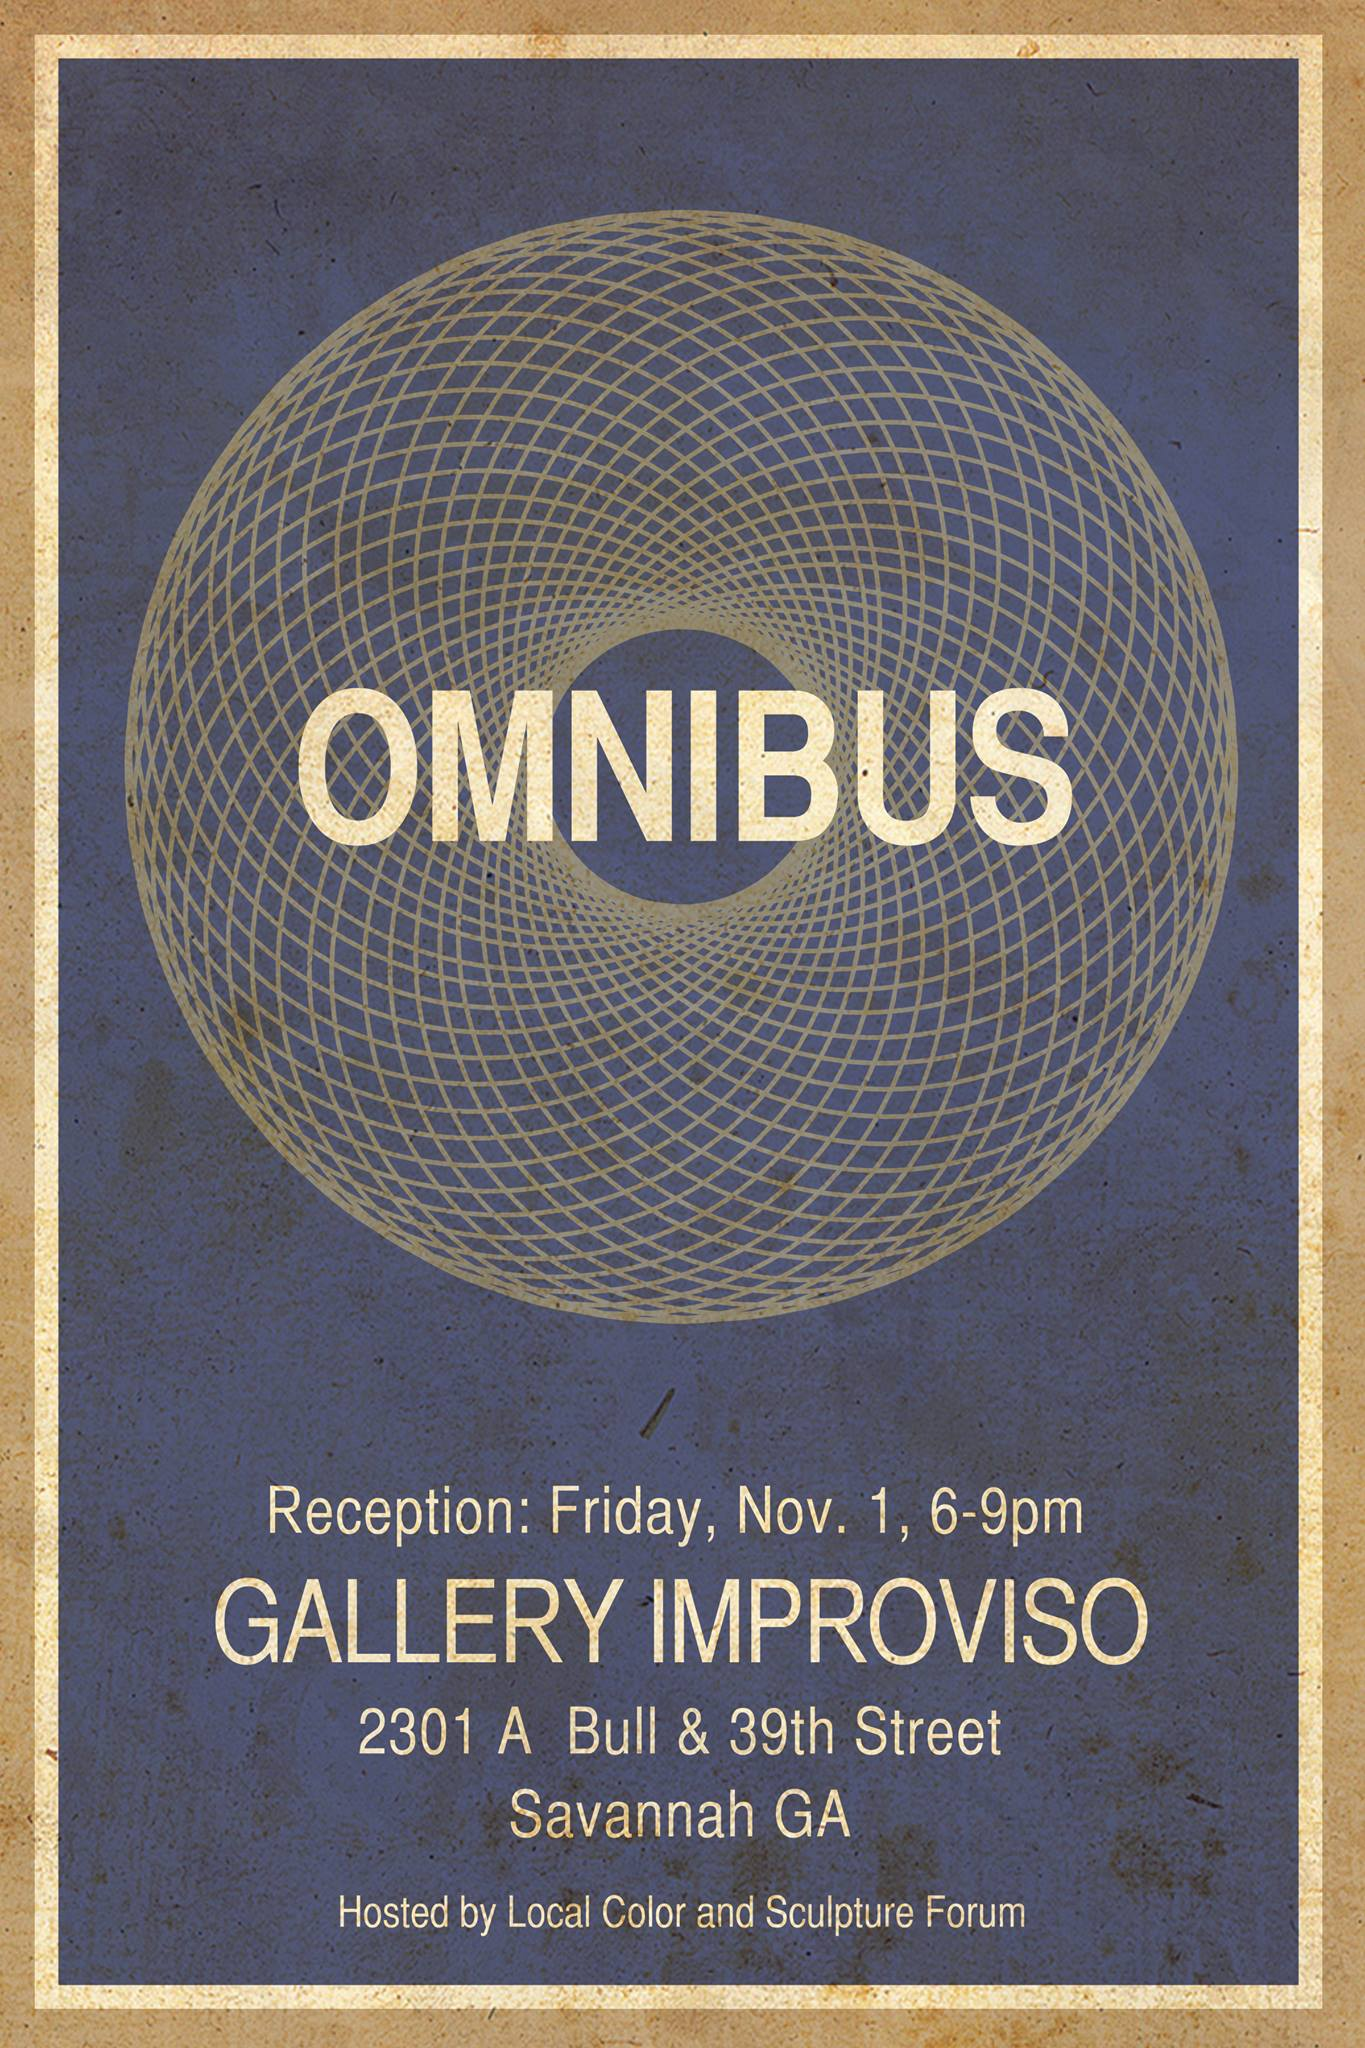 omnibus_showcard.jpg